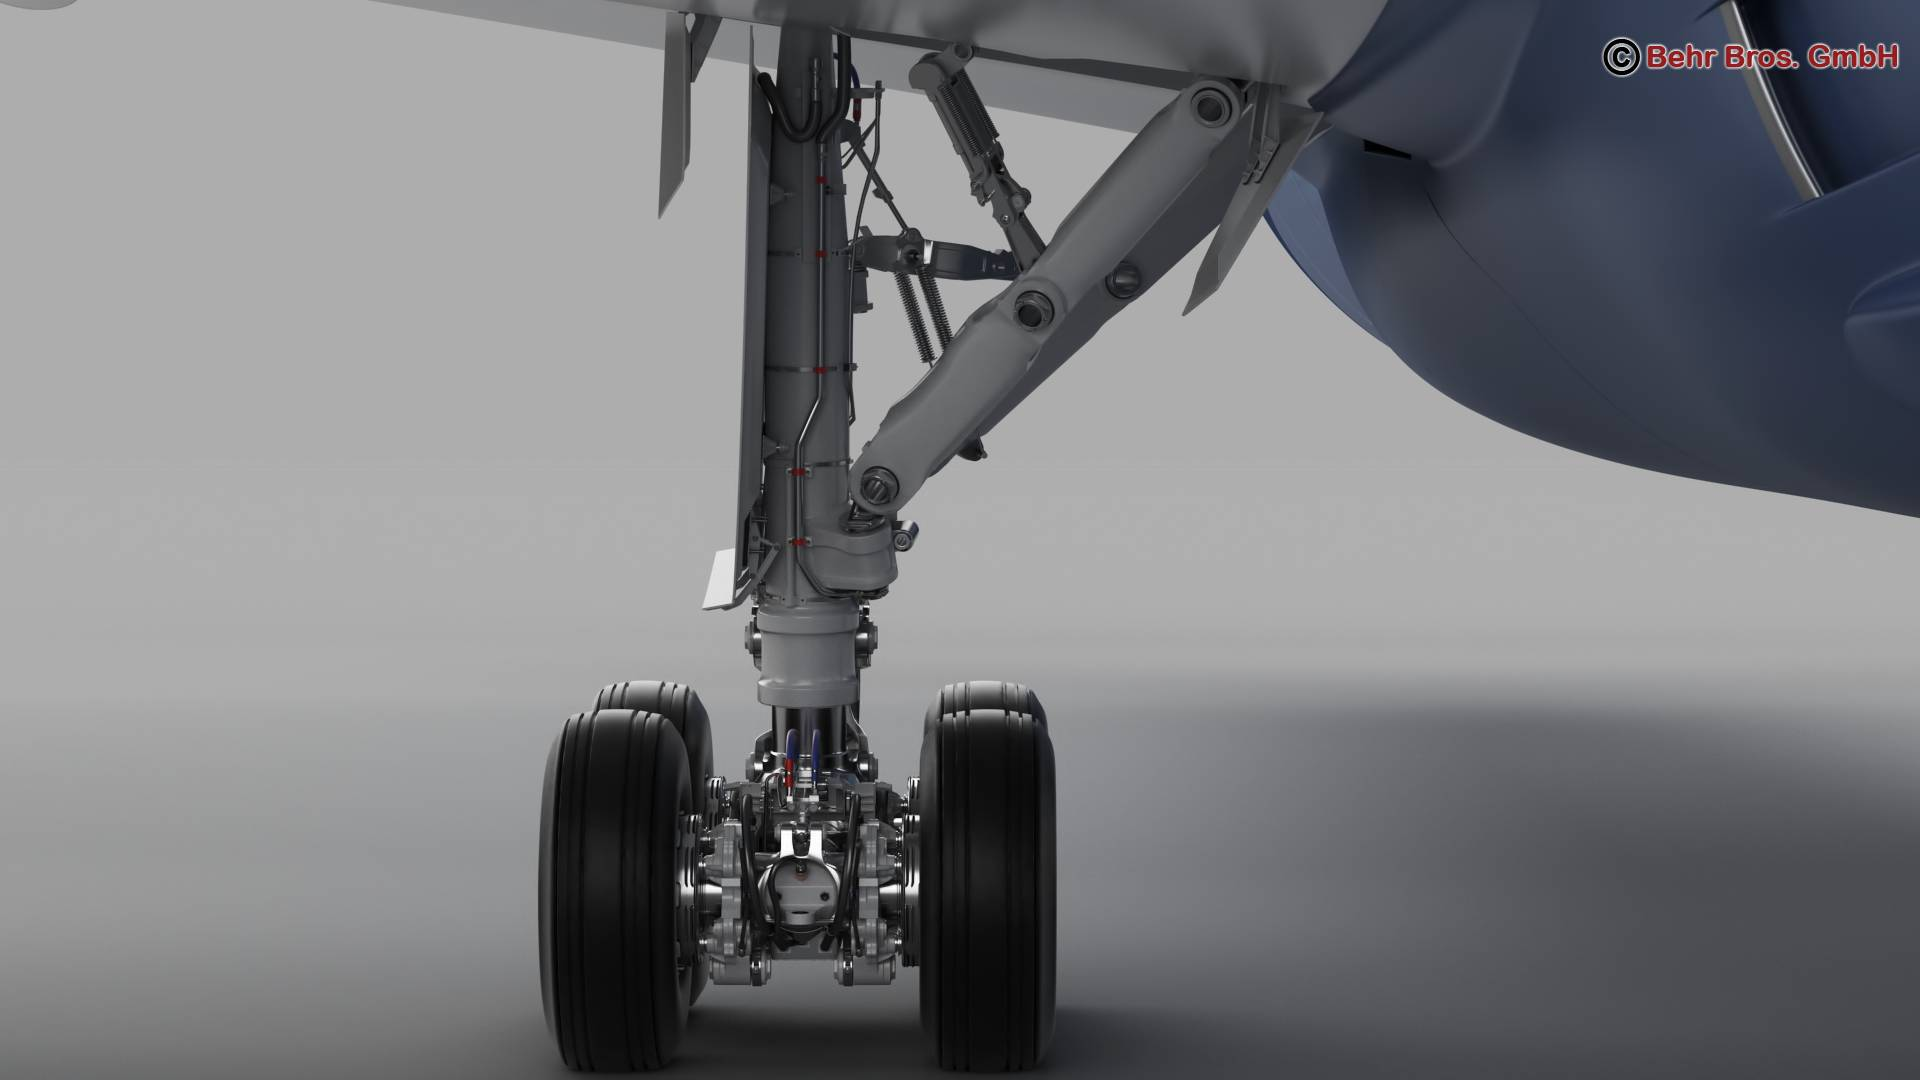 boeing 787-8 3d model 3ds max fbx c4d lwo ma mb obj 251350